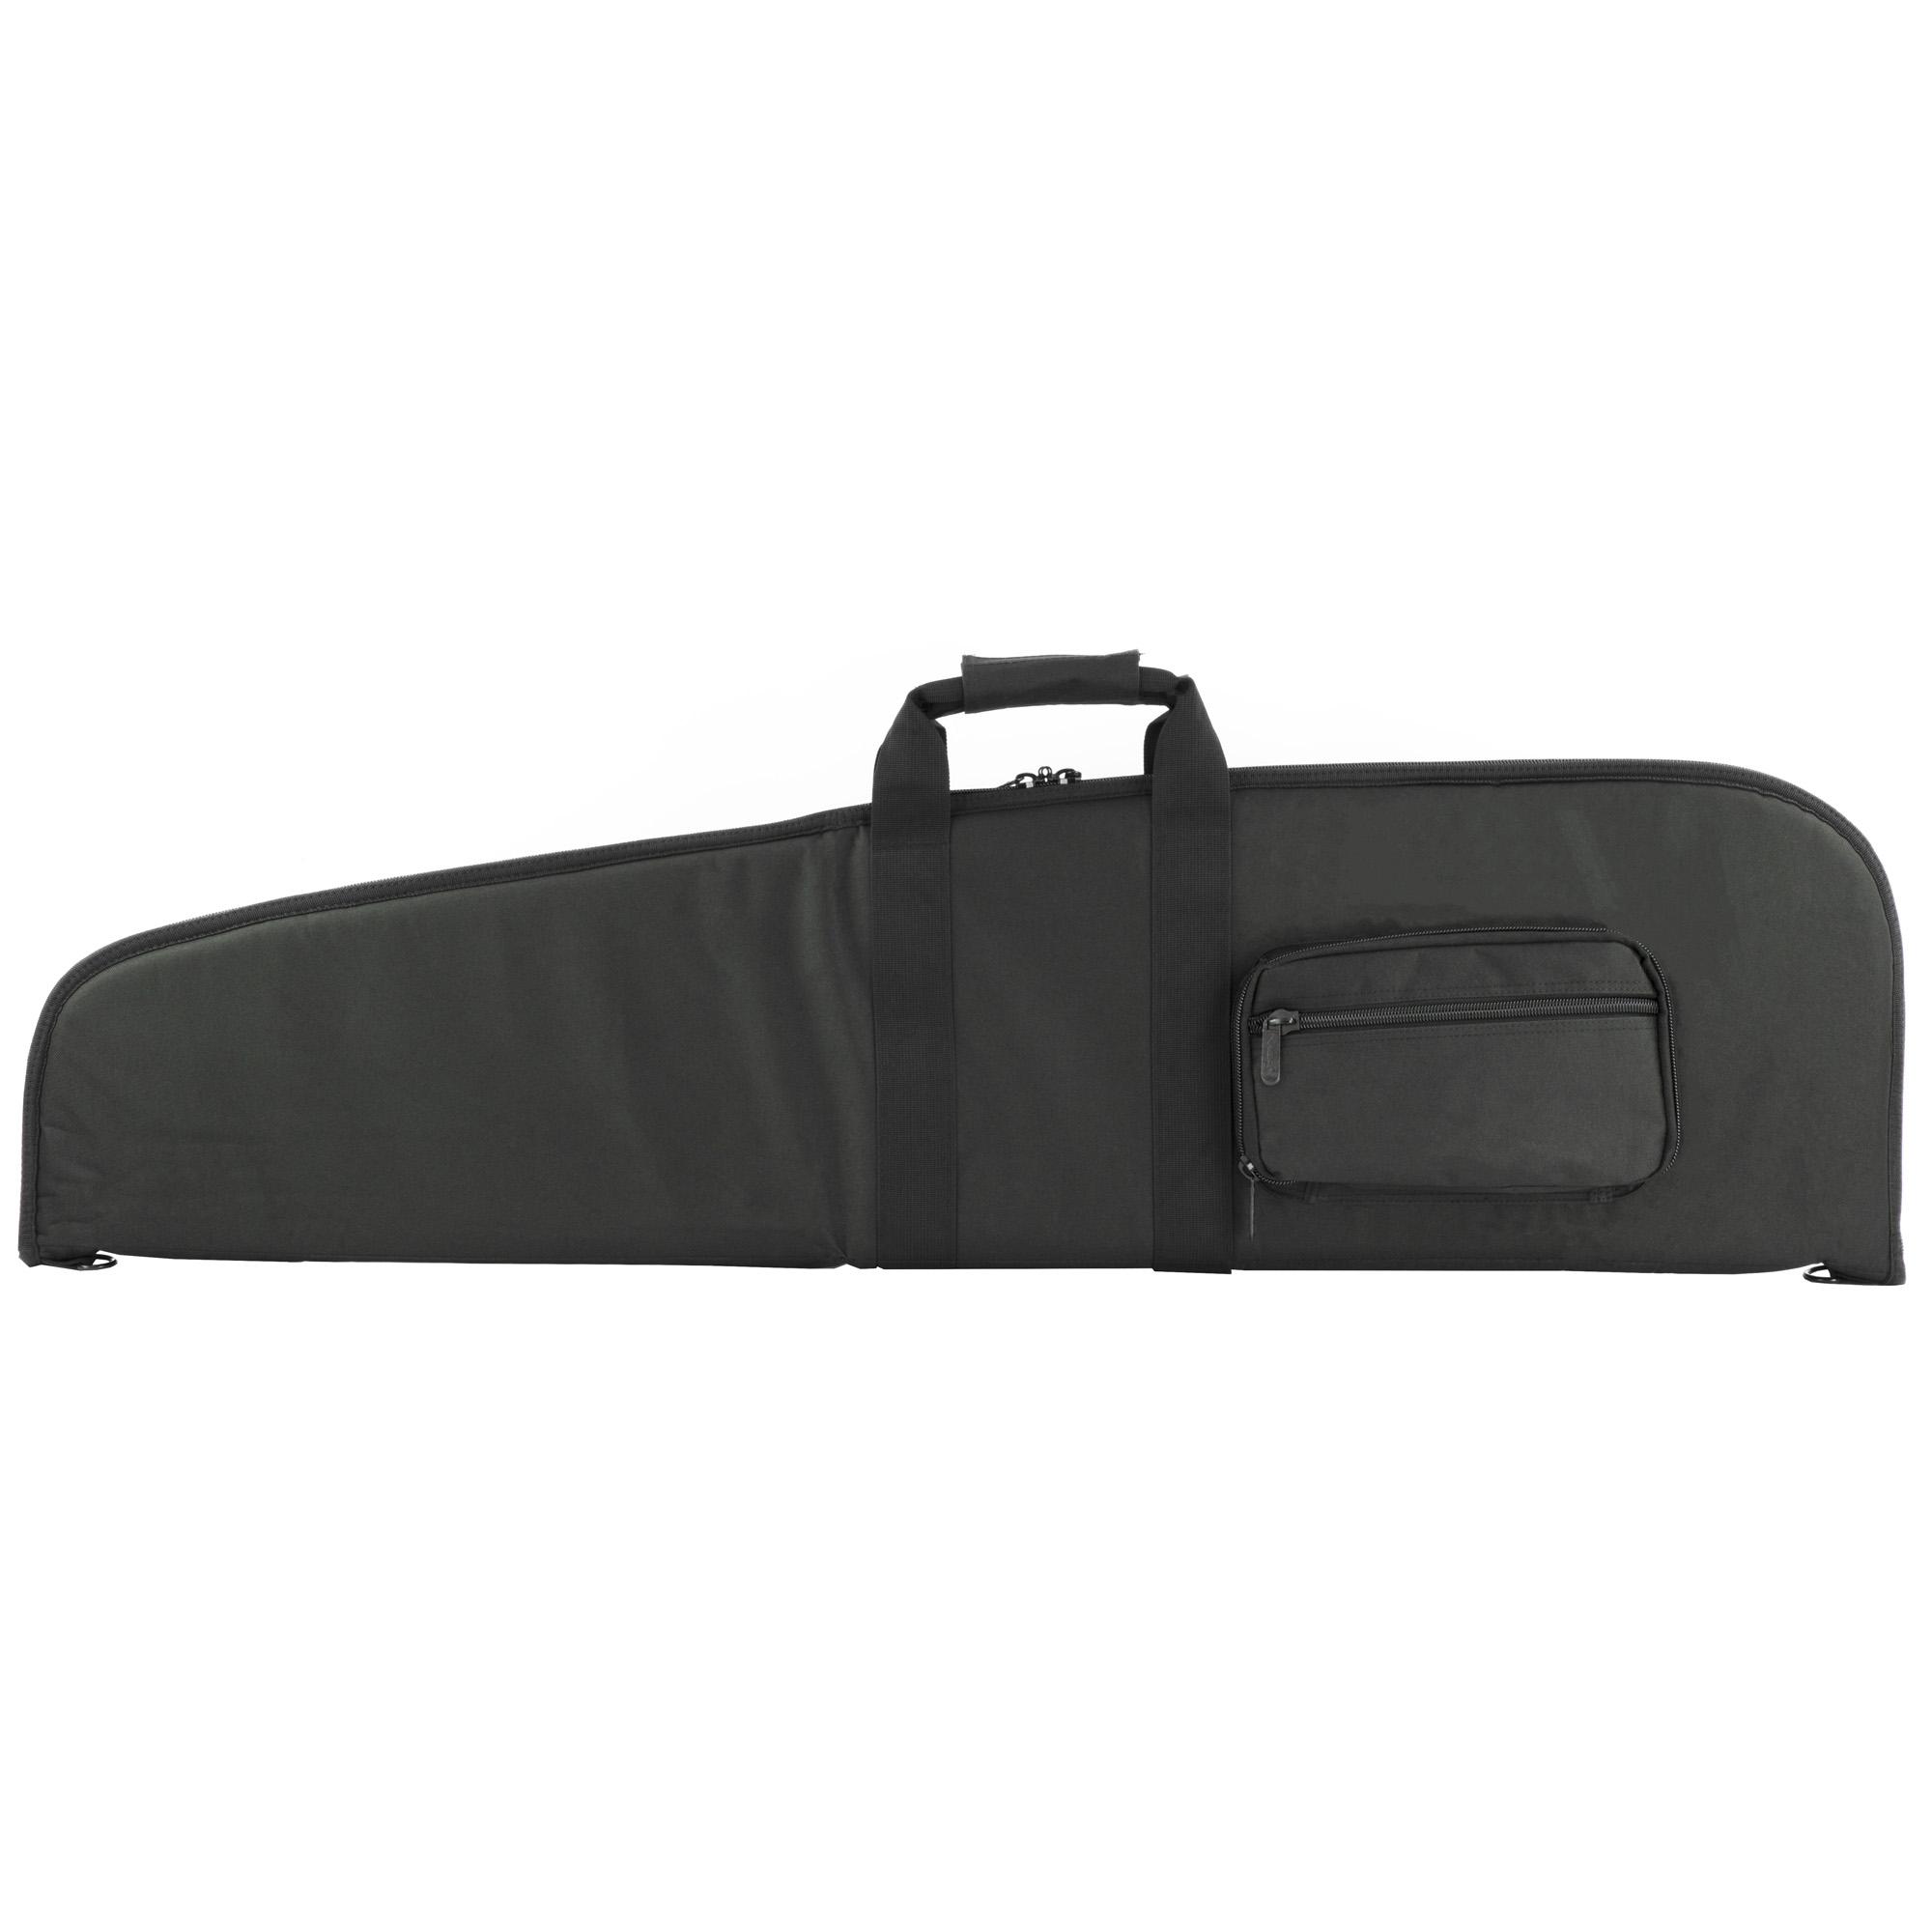 NCSTAR Scoped Rifle Case Nylon 48″ – Black